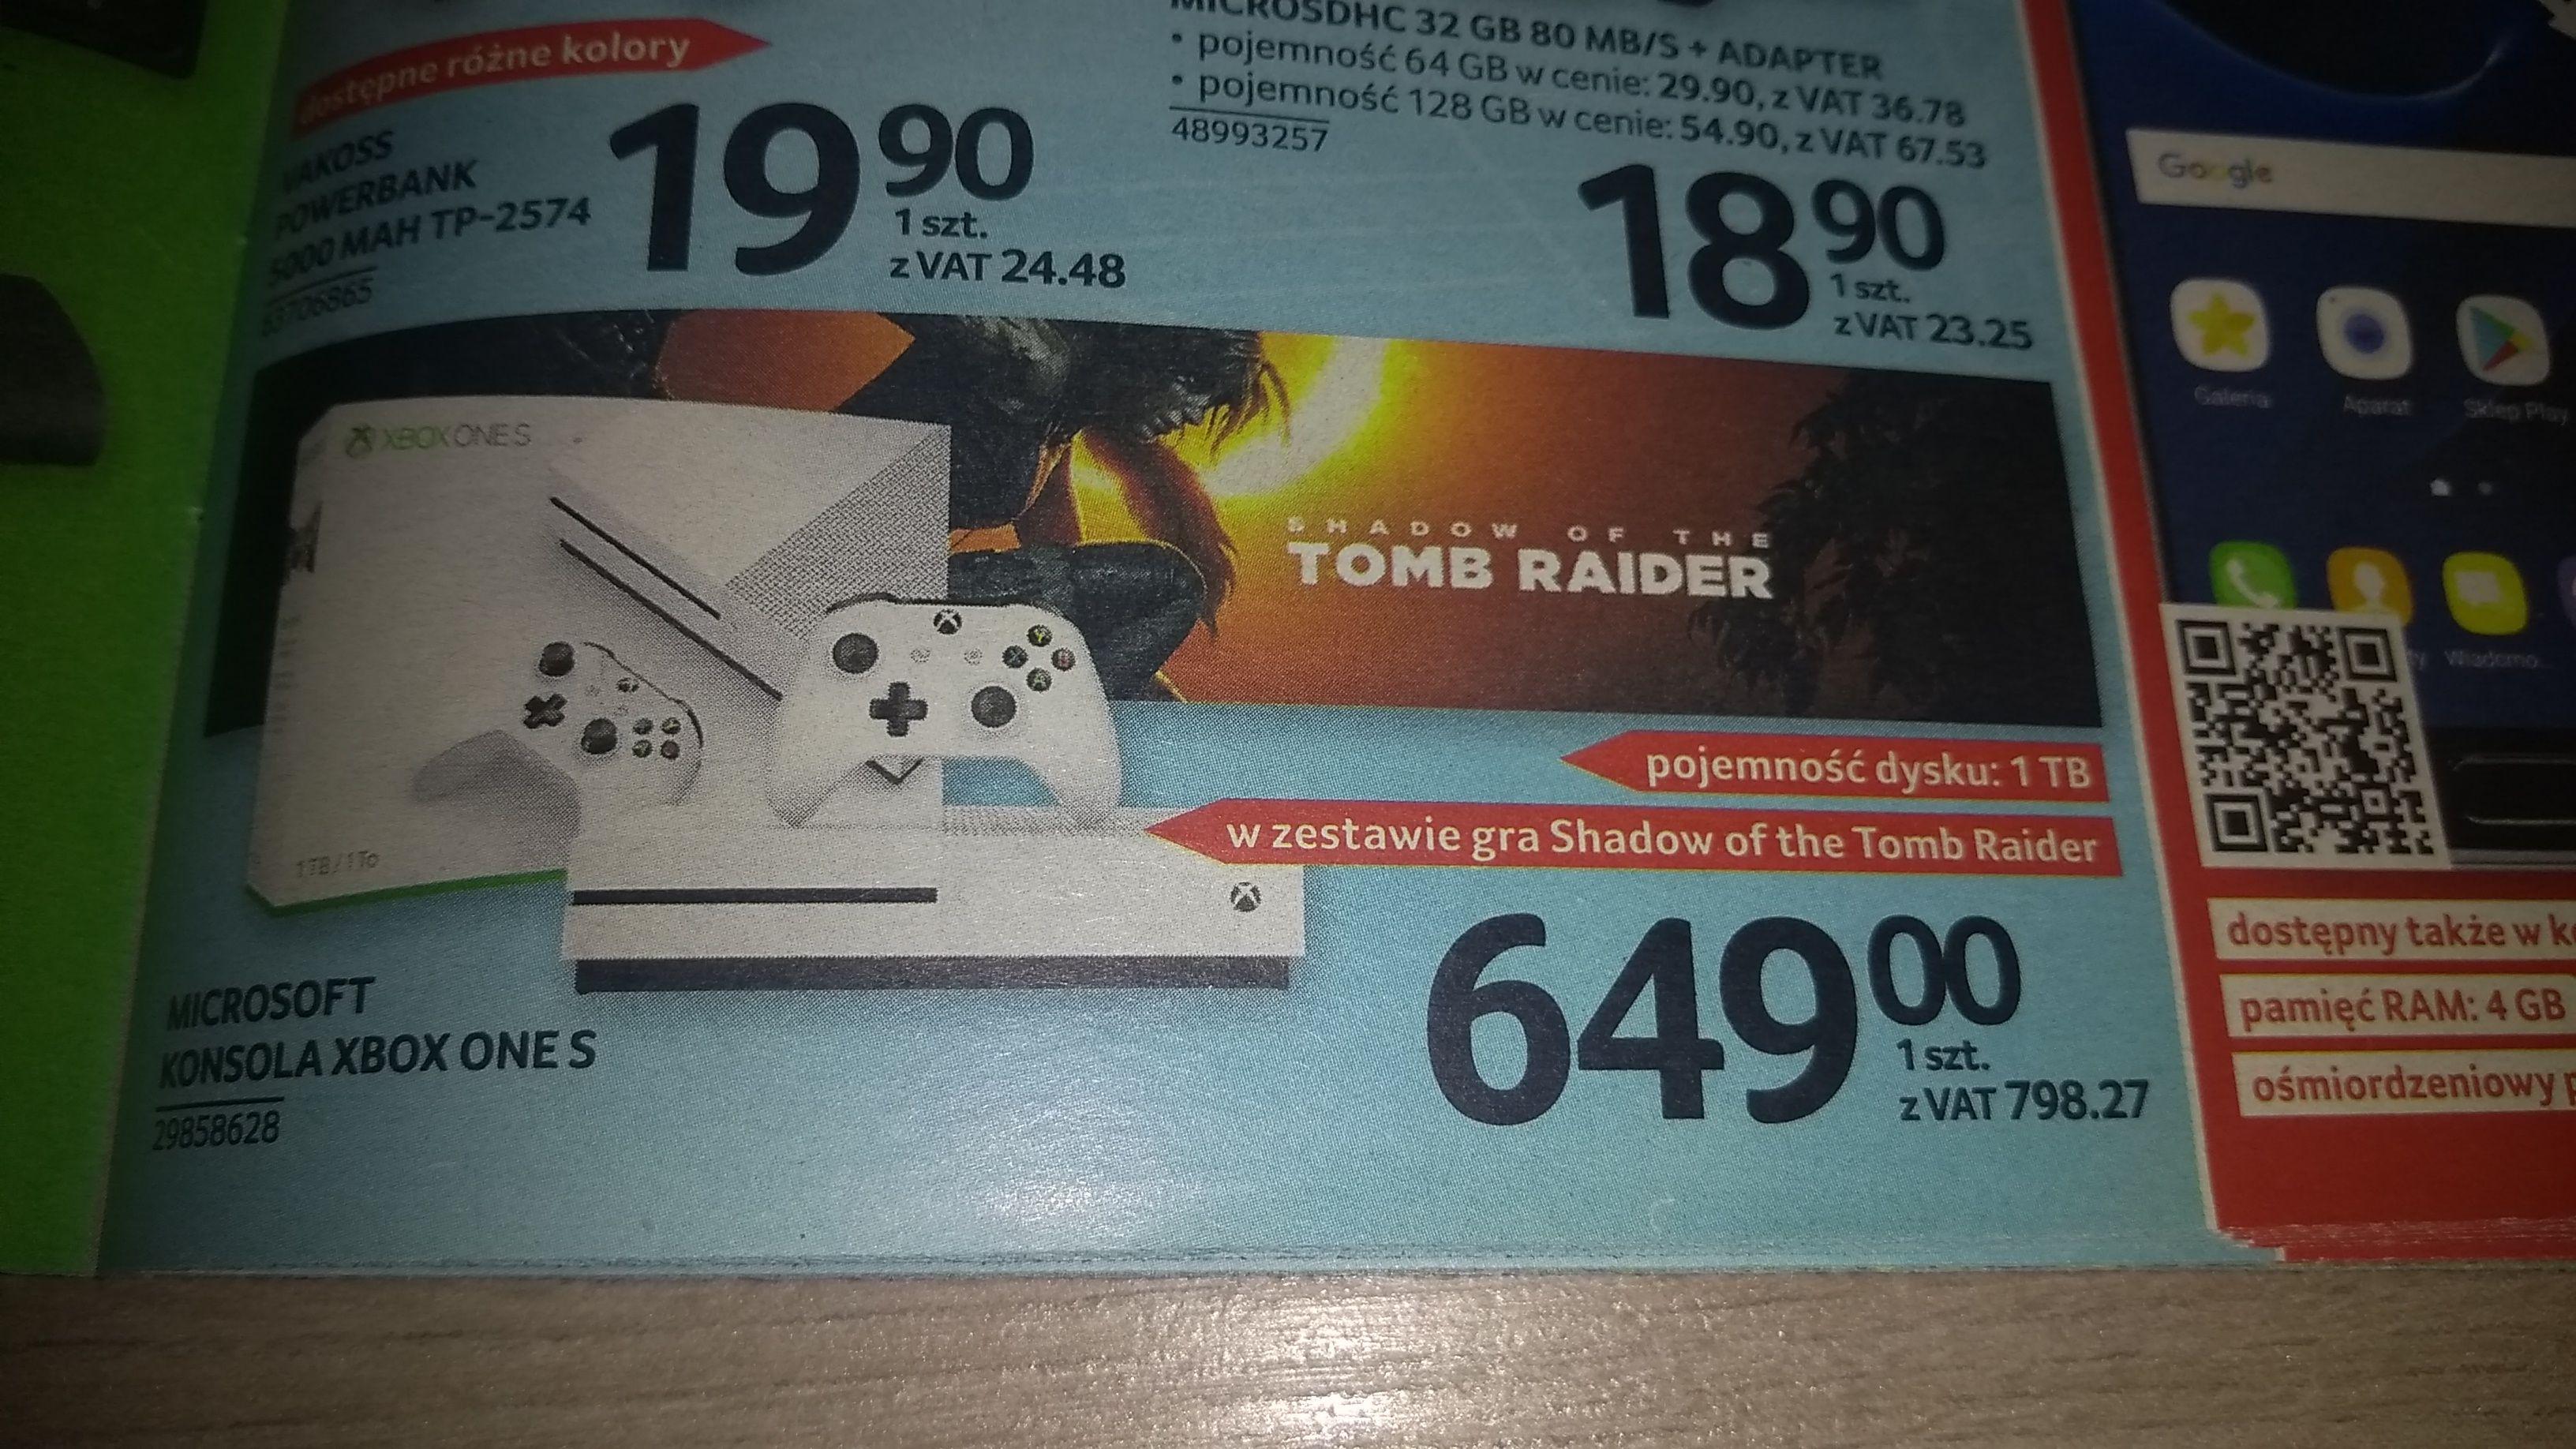 XBOX ONE S dysk 1TB + Shadow of the Tomb Raider w Selgros